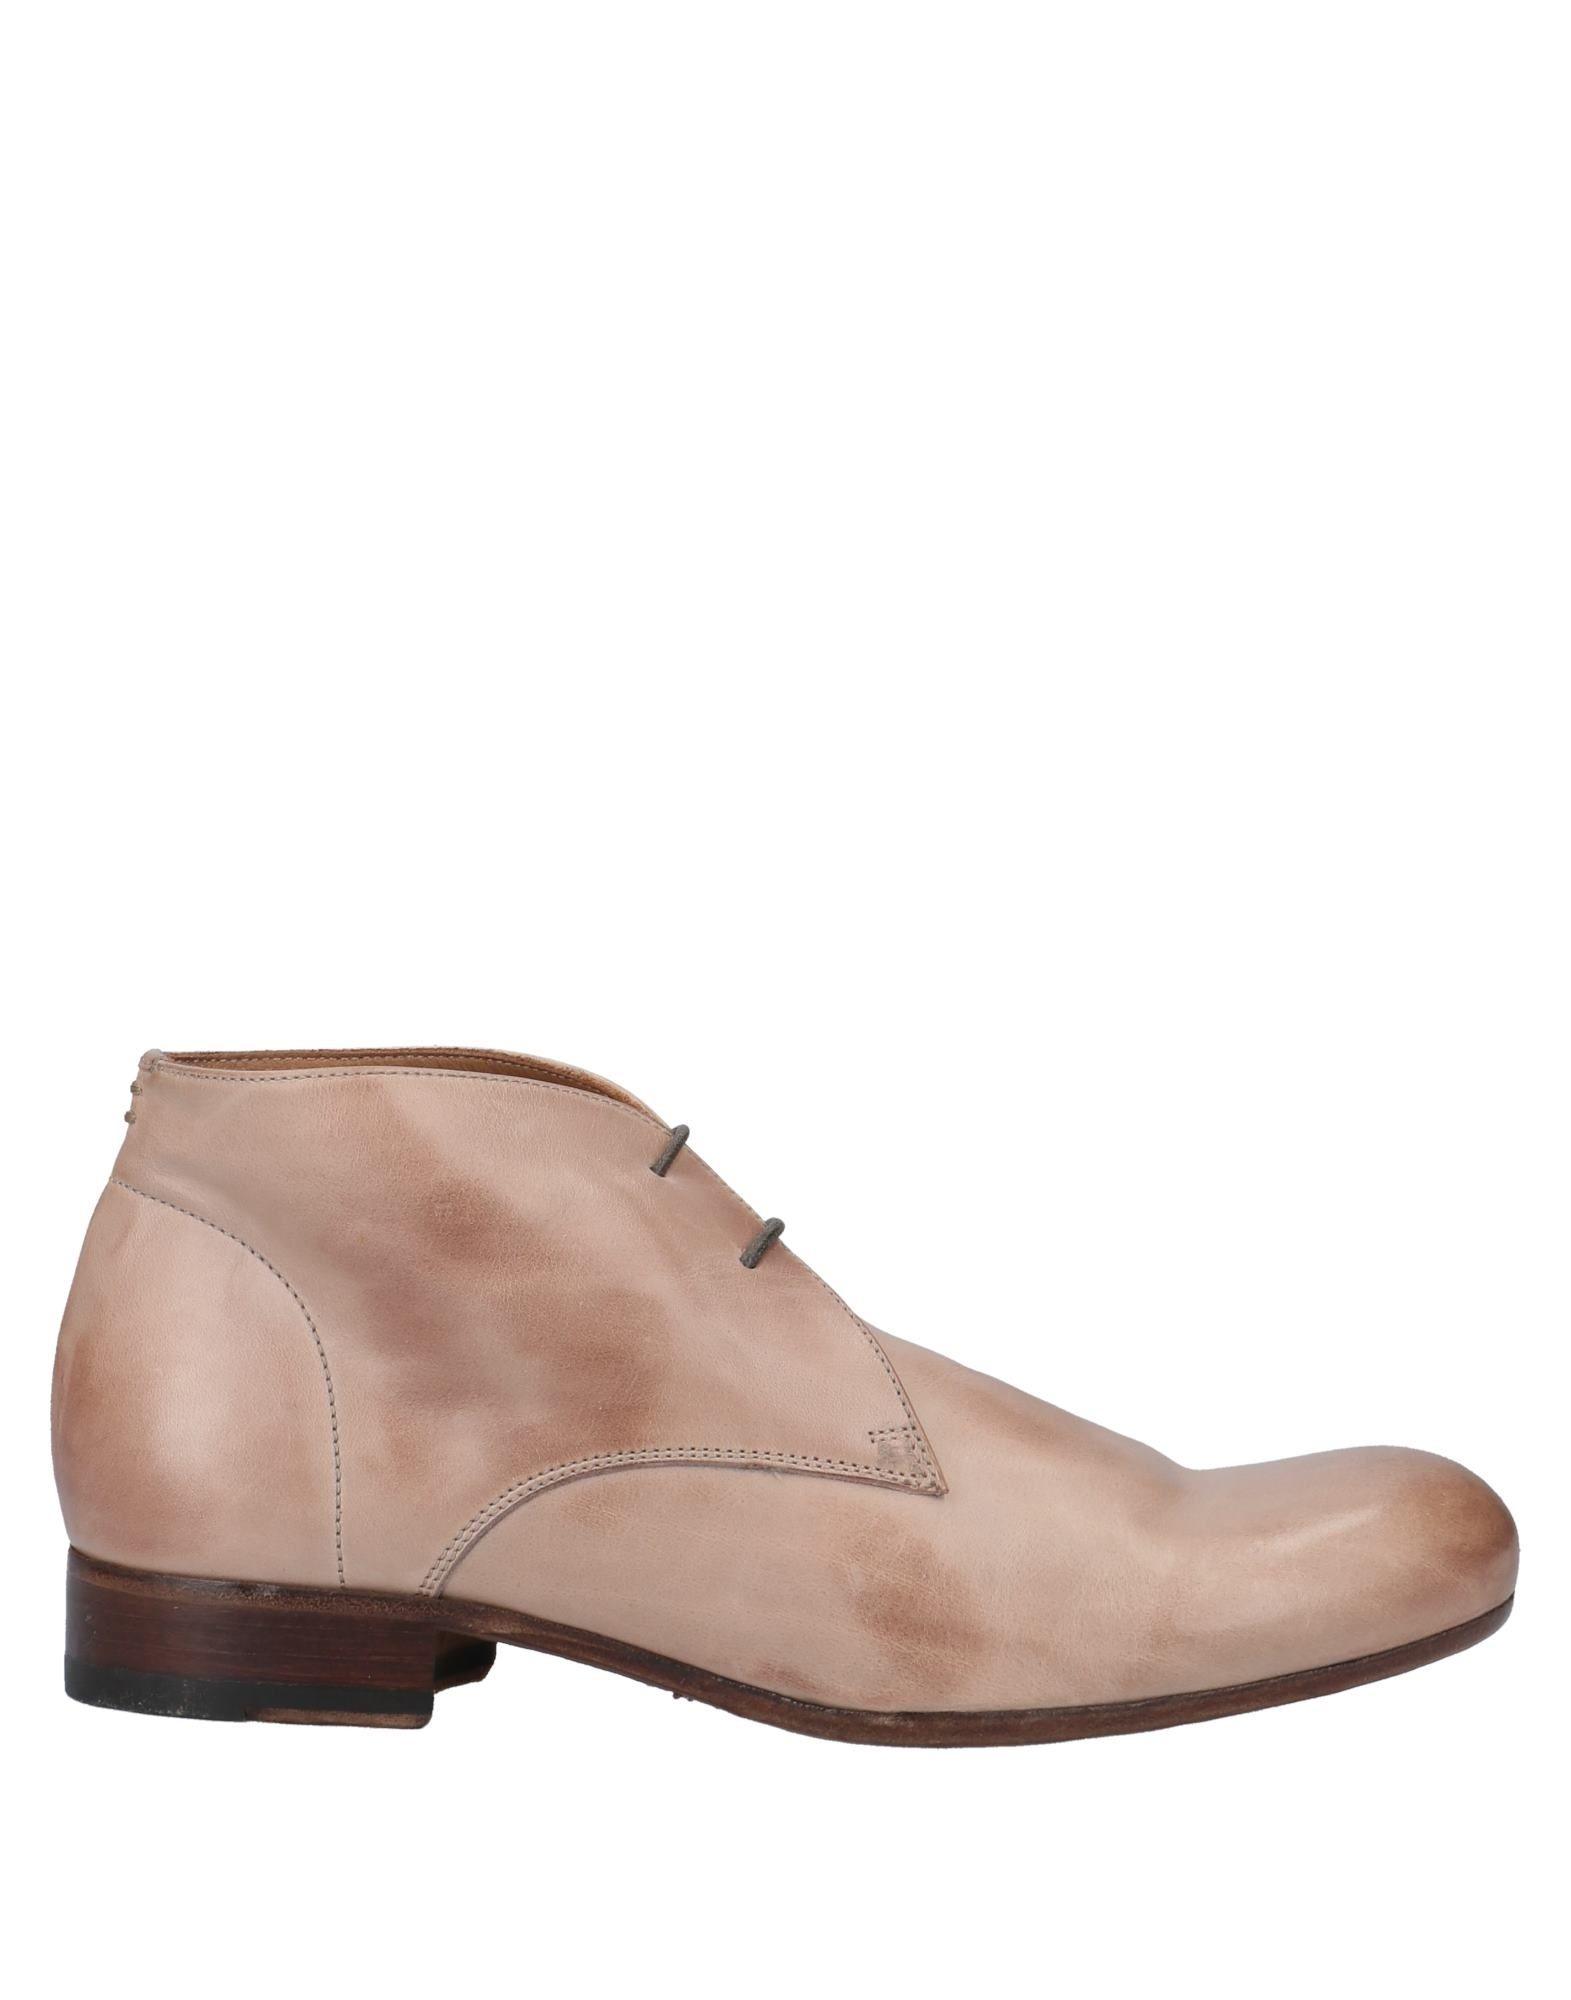 PANTANETTI Полусапоги и высокие ботинки pantanetti ботинки